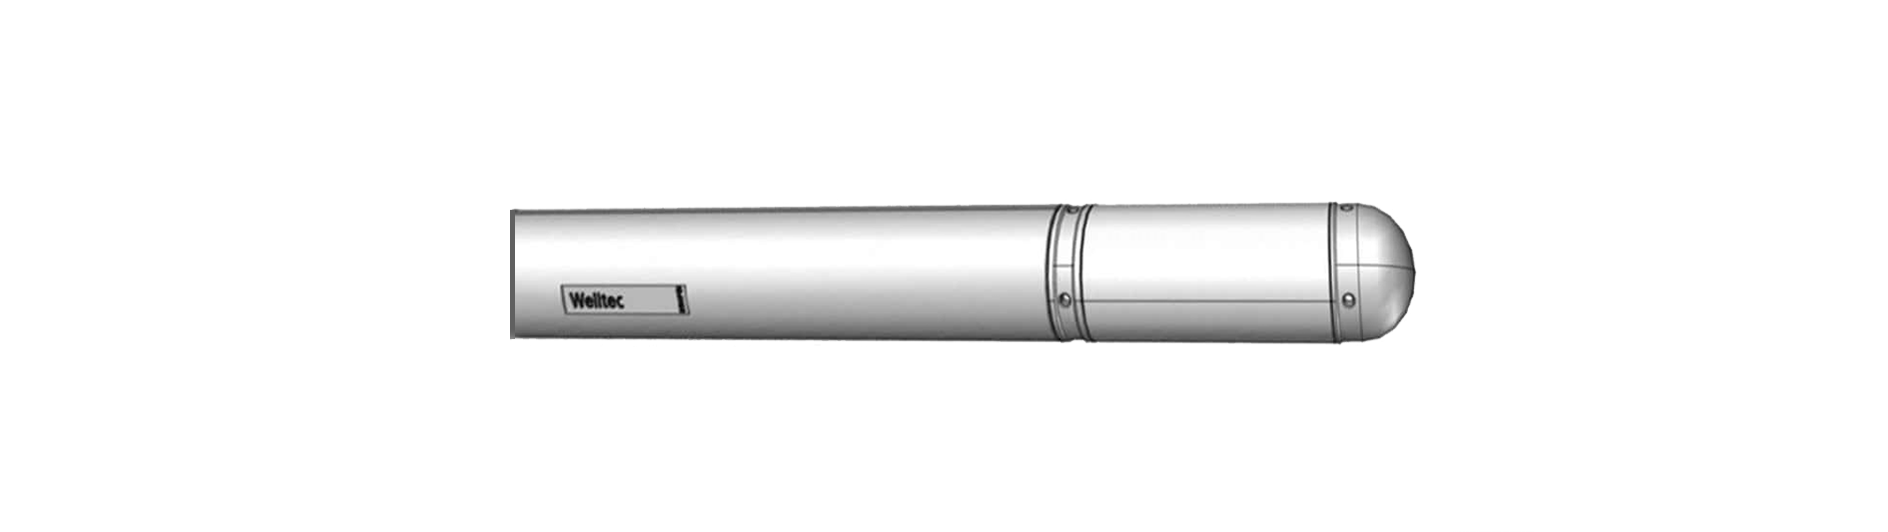 Welltec Fluid Imager (WFI) hori